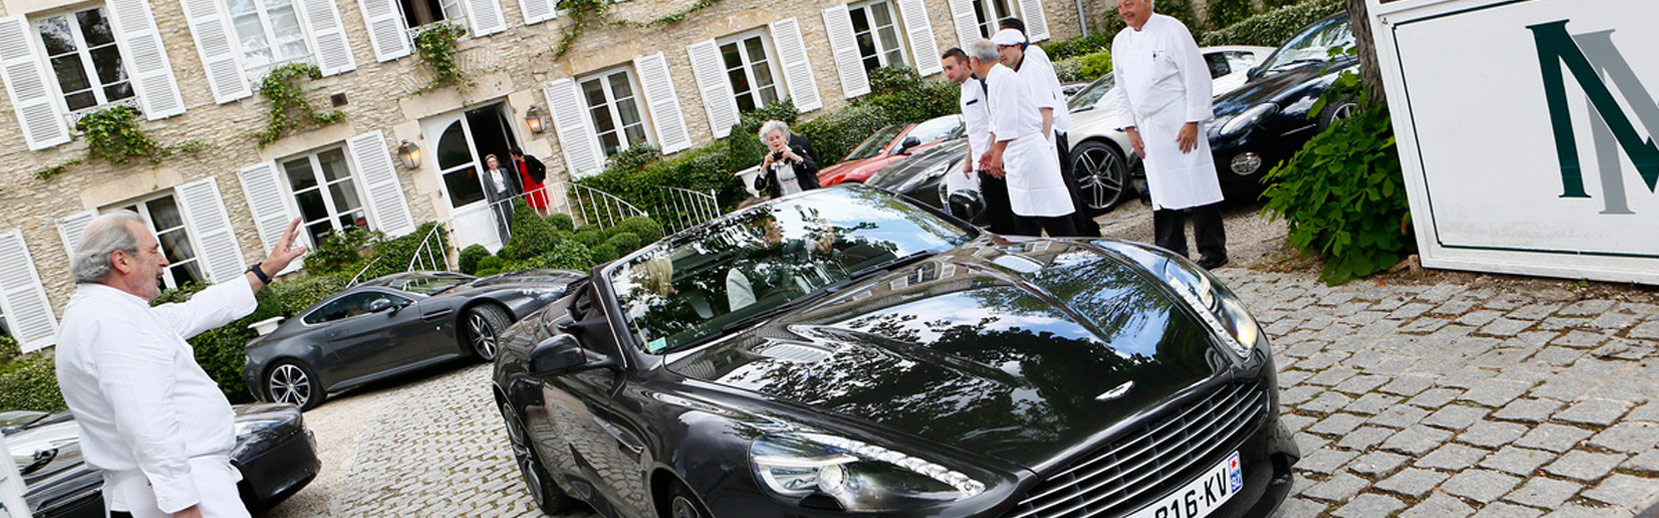 Le chef Marc Meneau accueille le rallye Aston Martin à l'Espérance